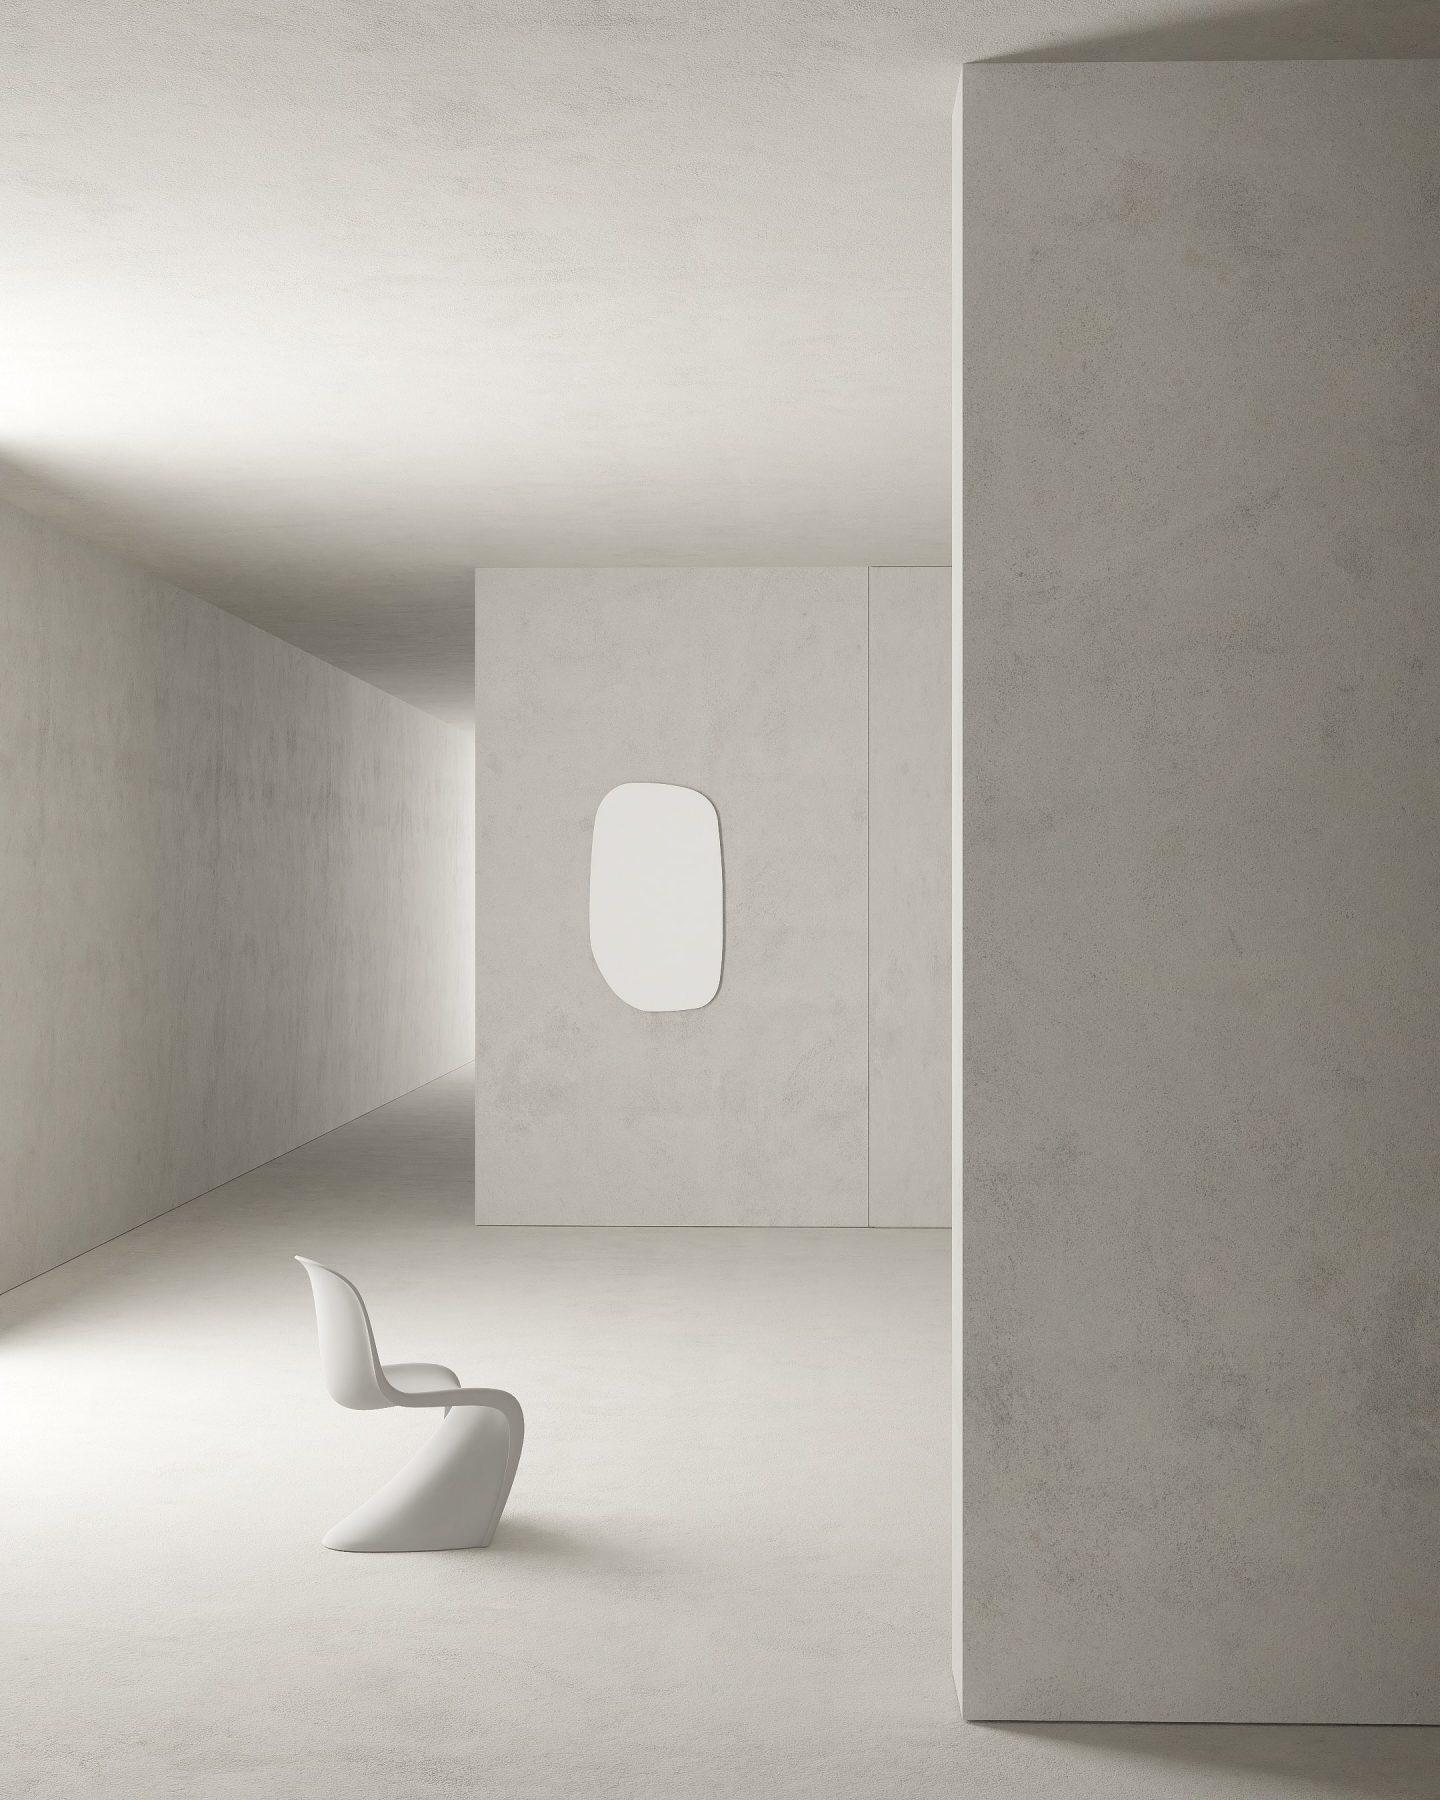 IGNANT-Design-Interview-Osminina-3